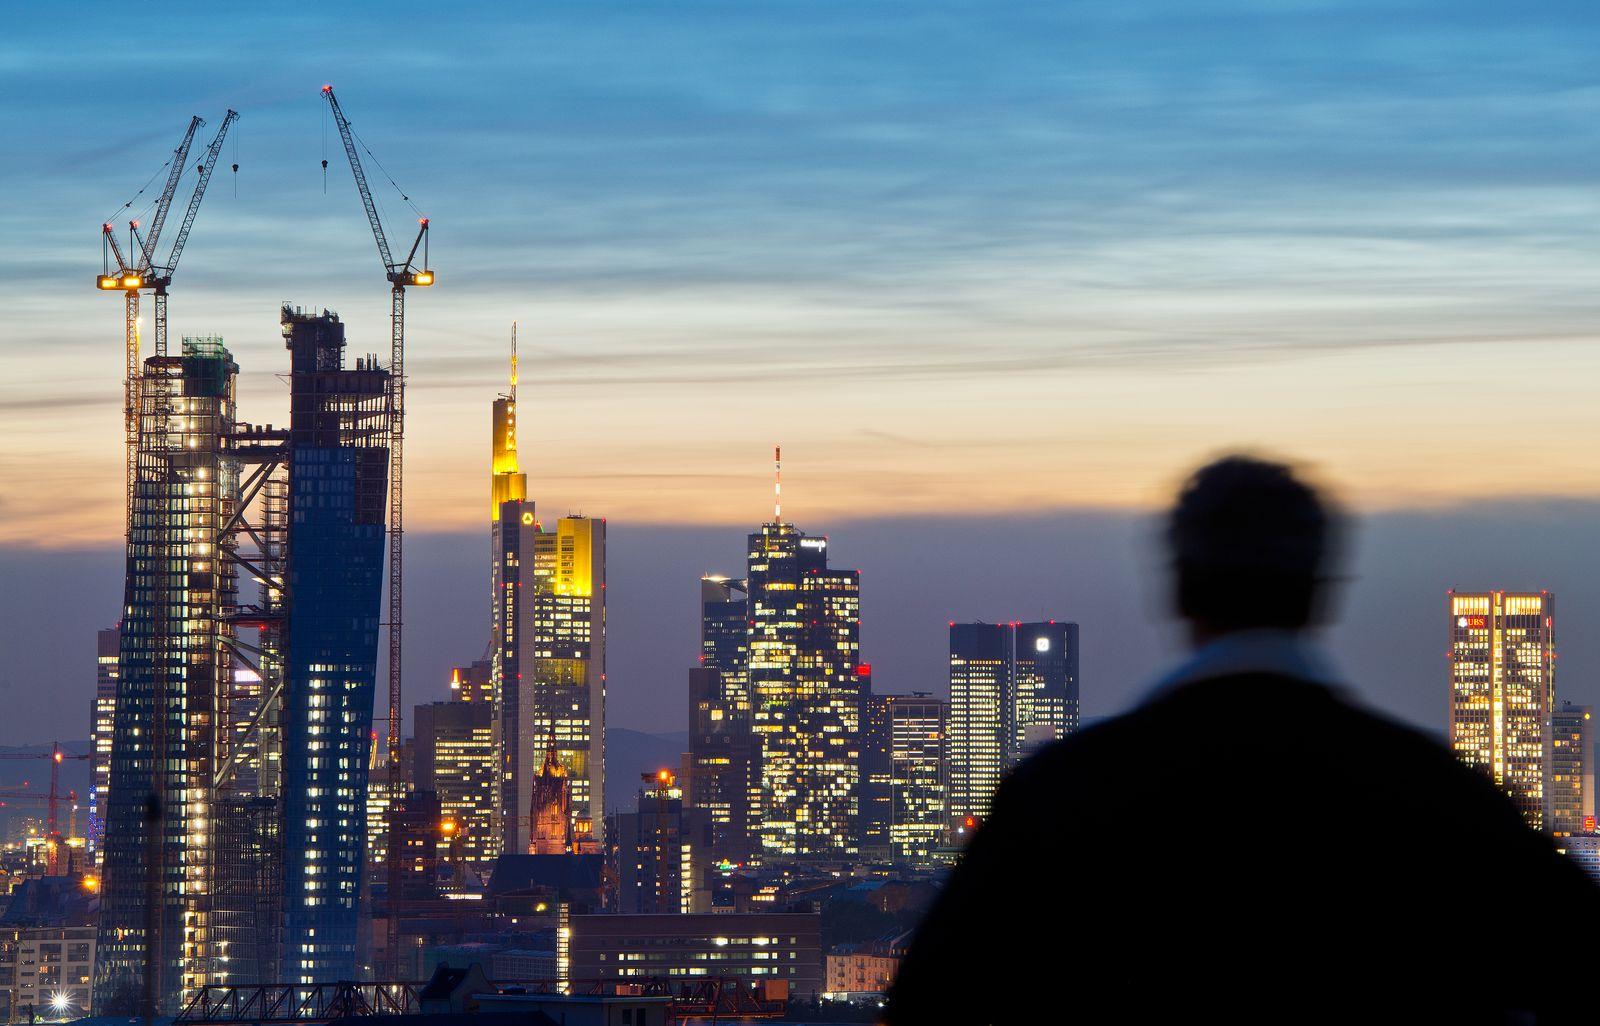 Frankfurt / Banken / Banken-Viertel / Skyline / EZB